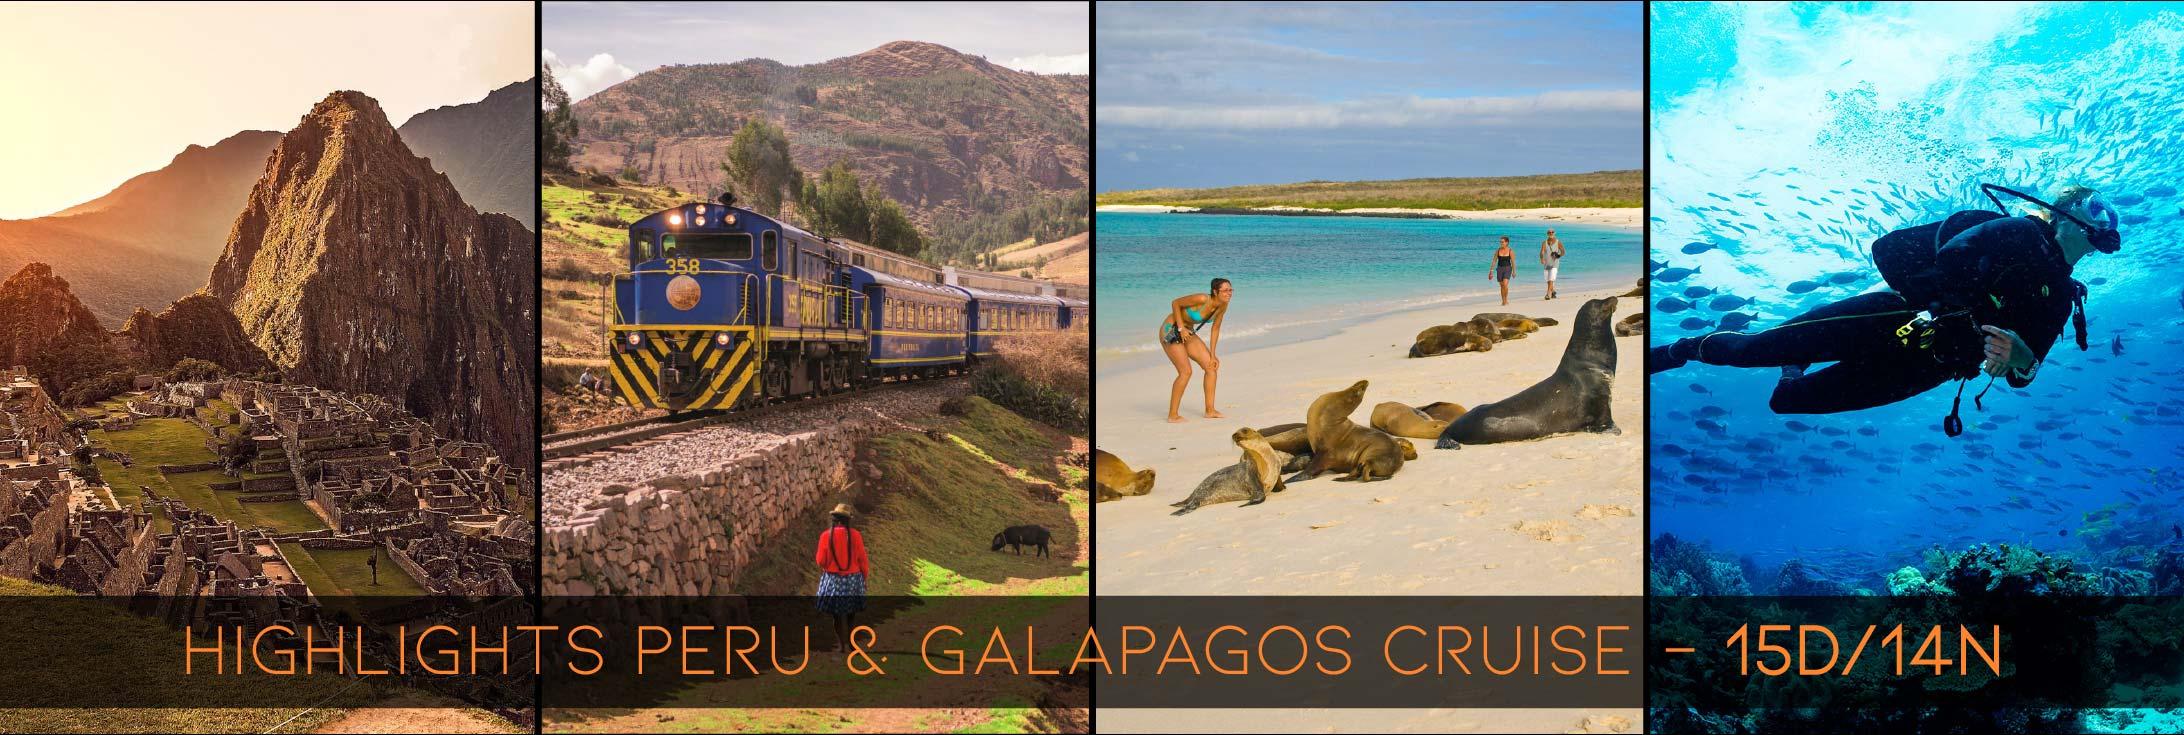 Tour Peru Galapagos